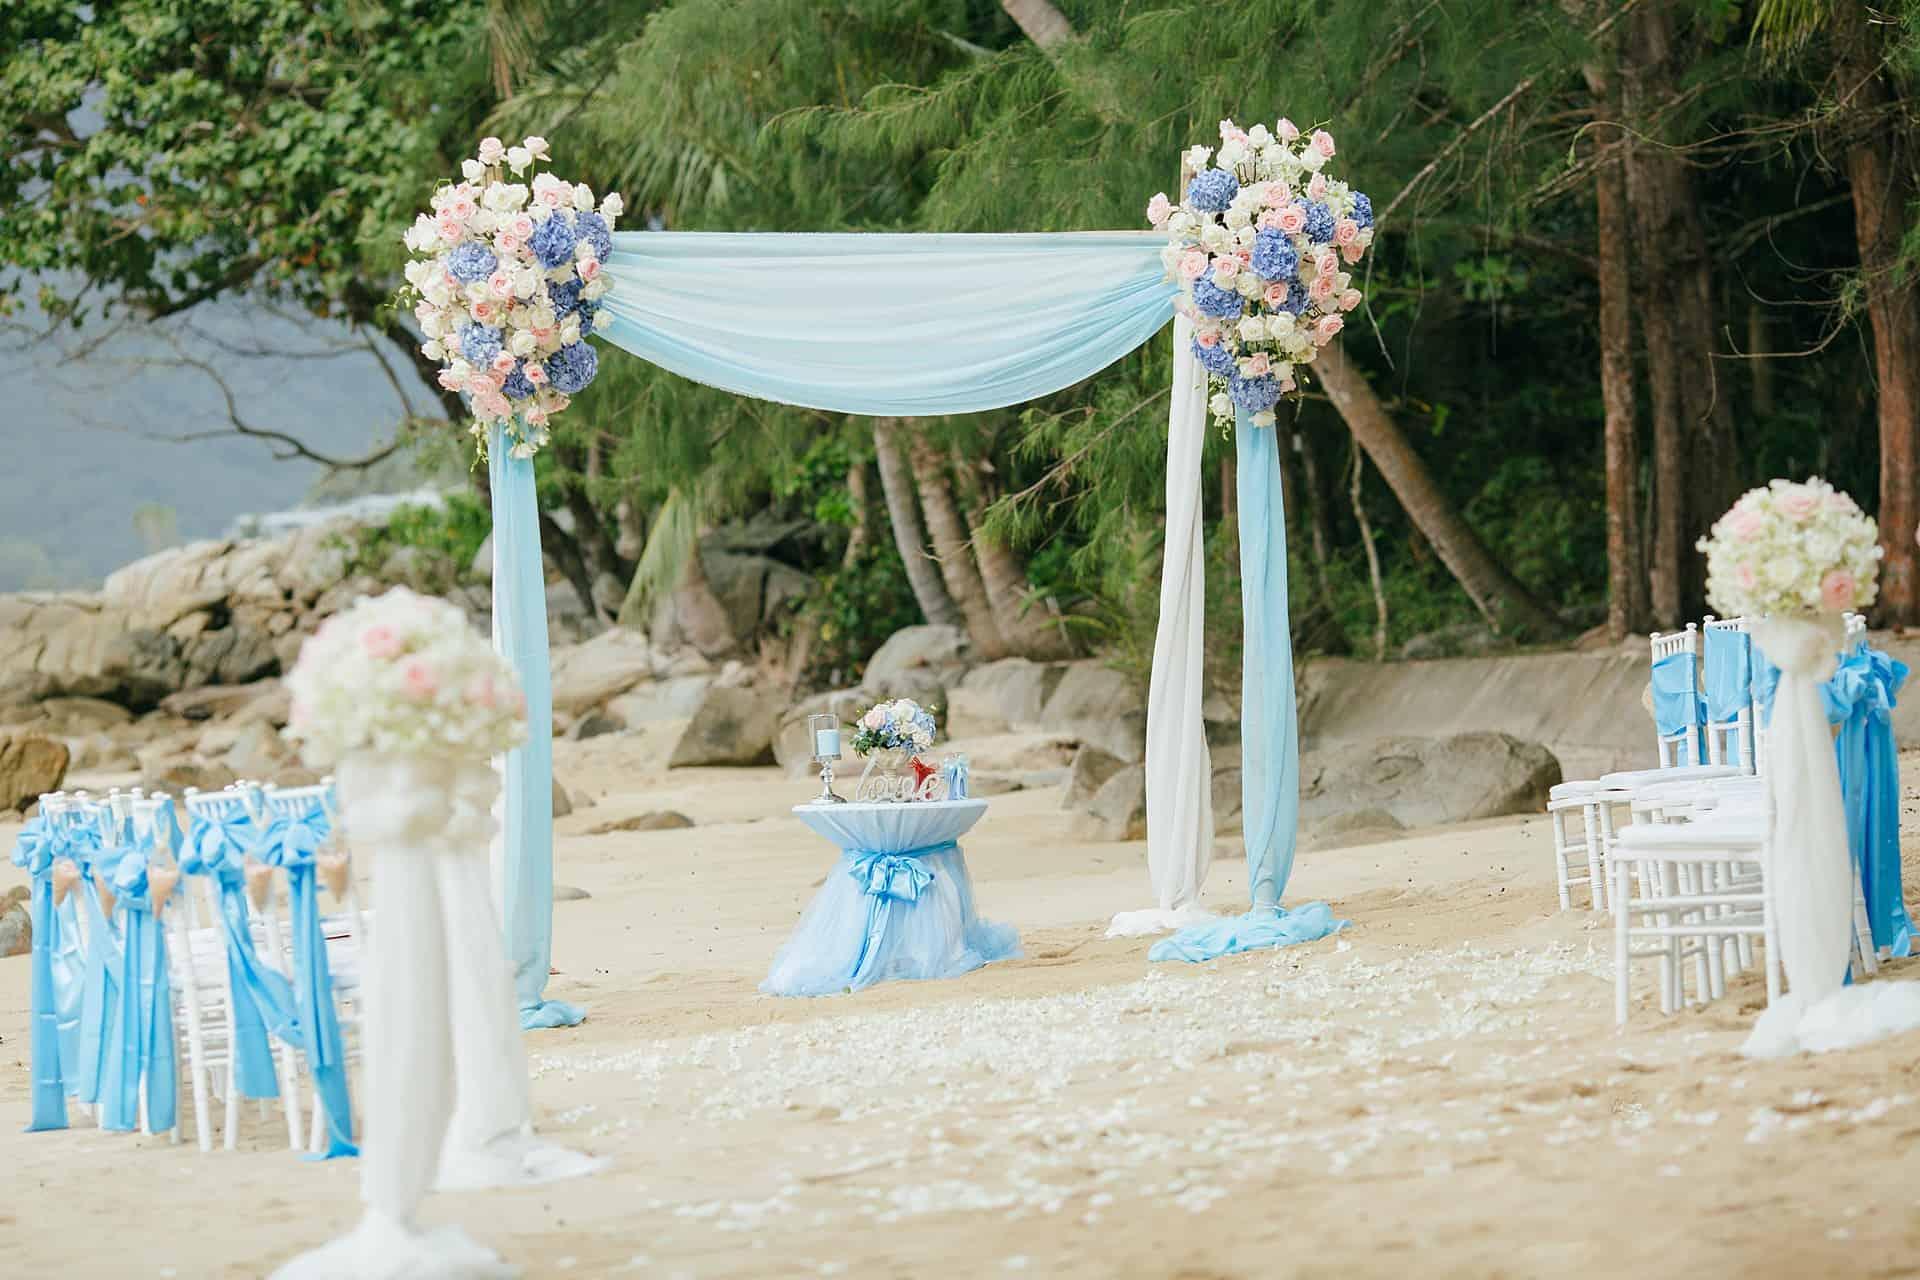 Wedding Haruka & Ronny, Hua Beach 8th September 2018 232